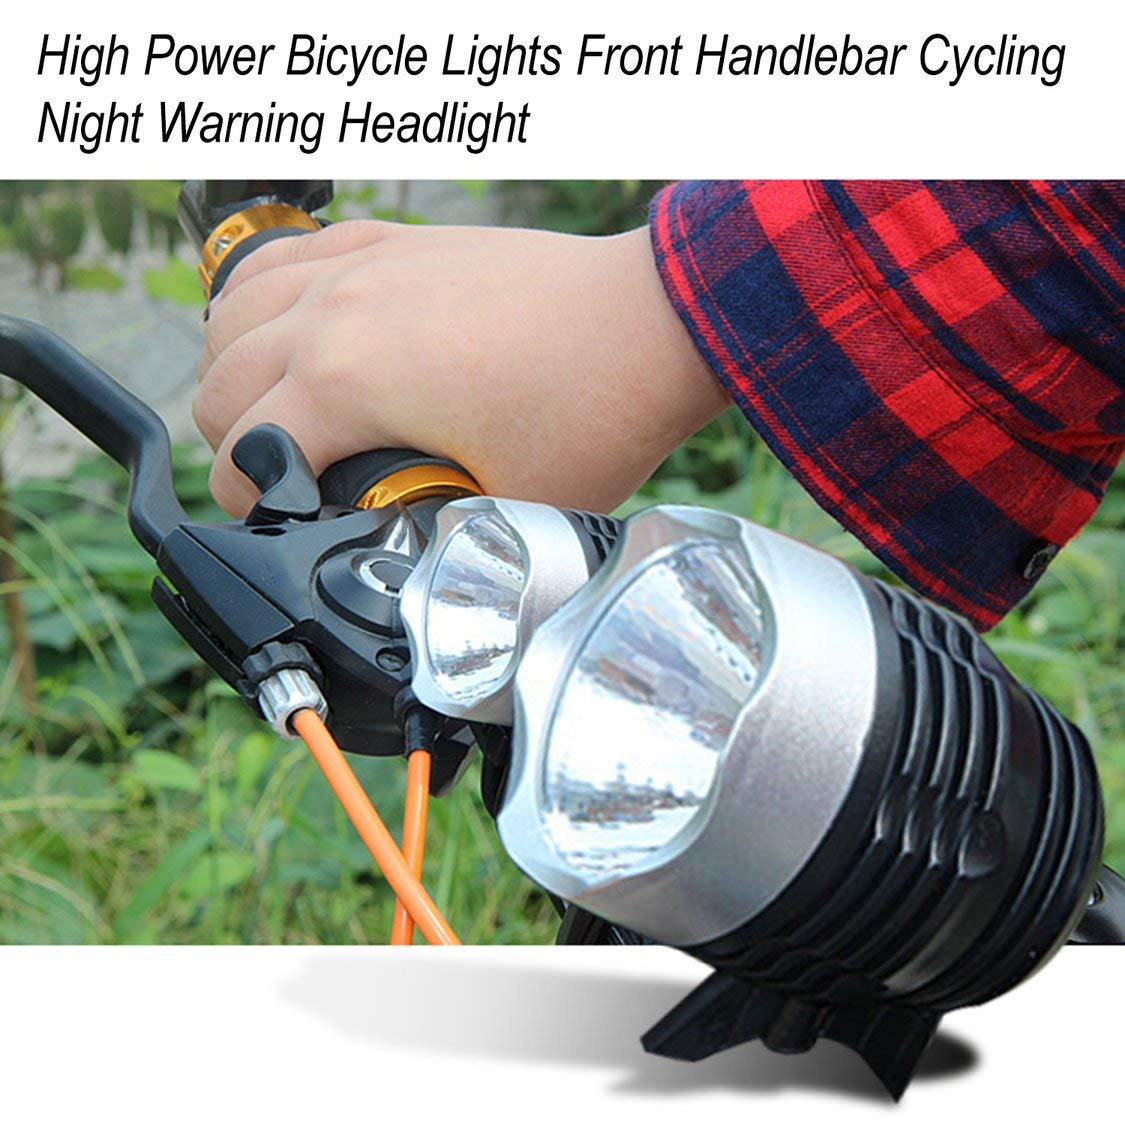 Fancysweety High Power Bicycle Bike Lights Front Handlebar Cycling Night Warning Safety Headlight Flashlight Bike Accessories